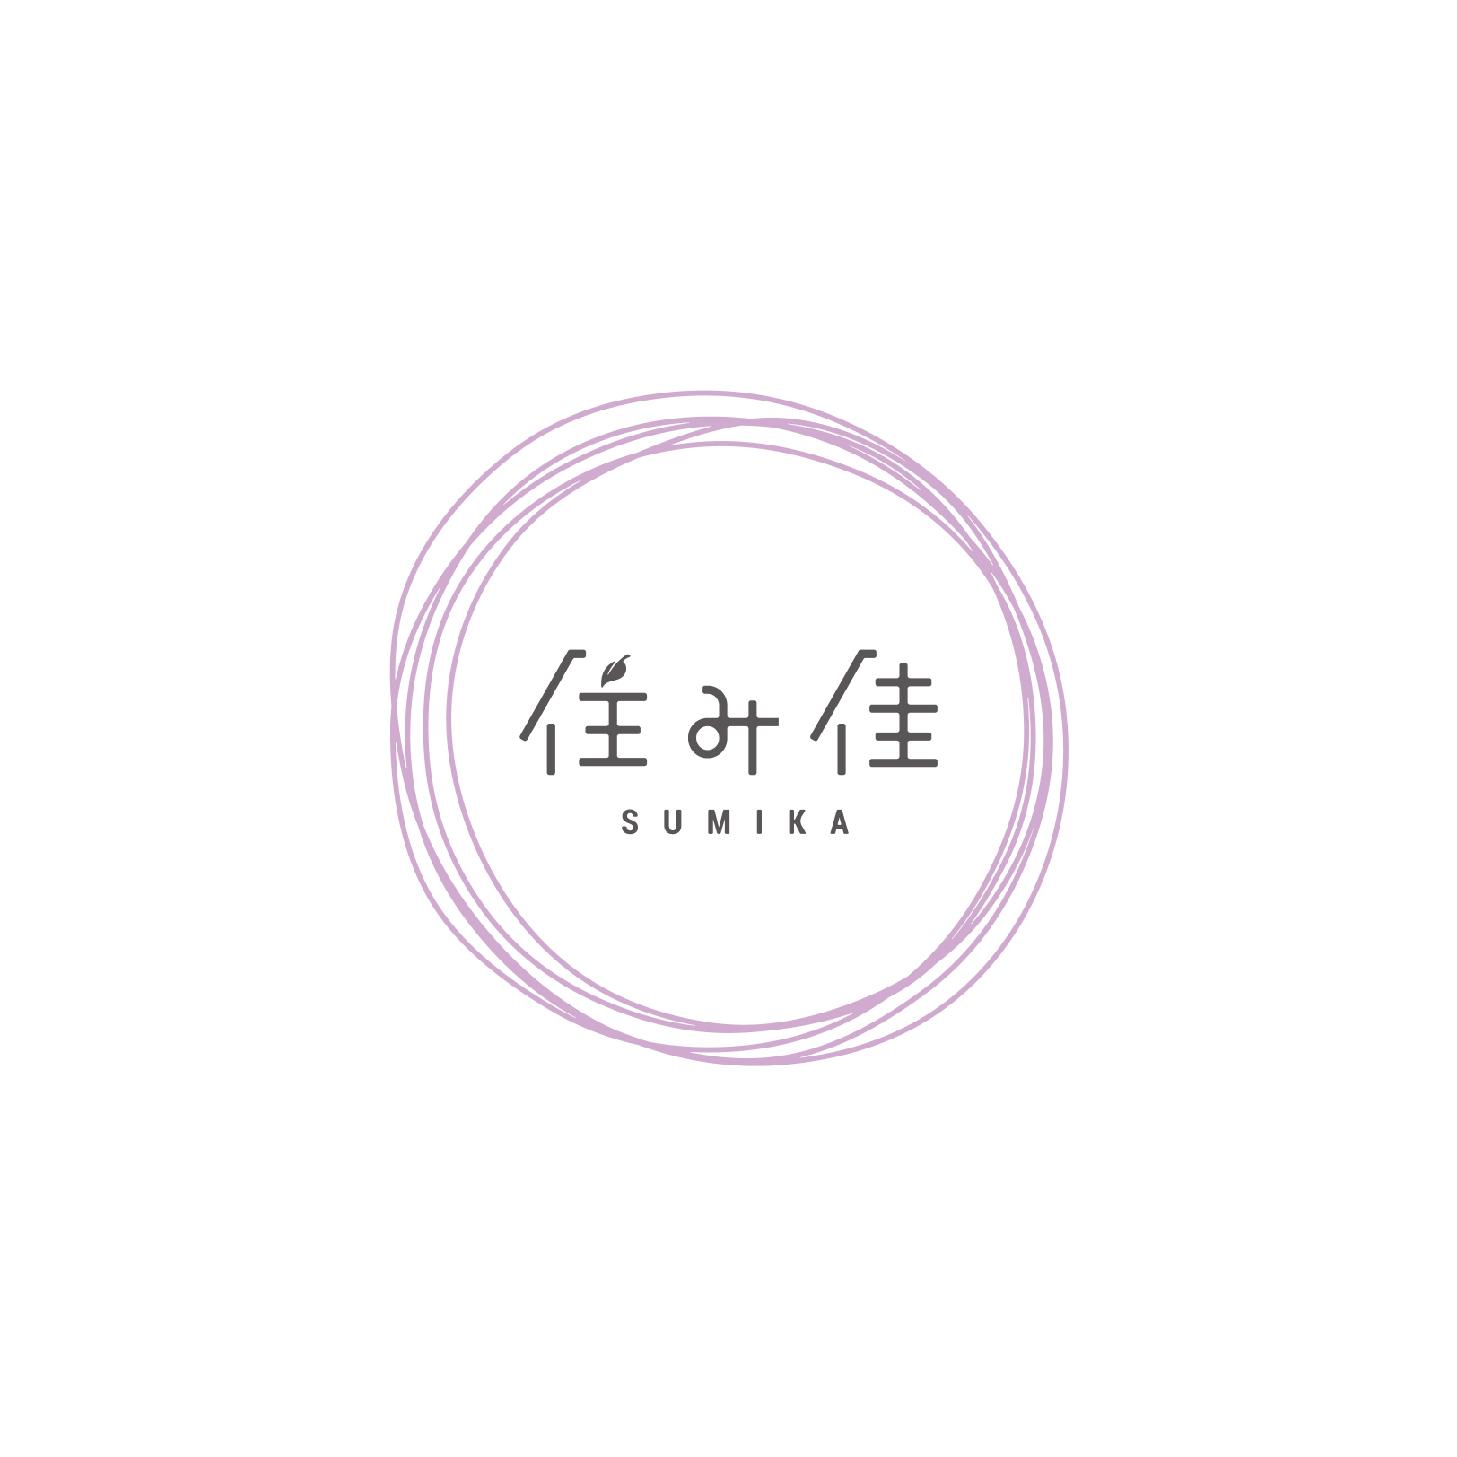 sumika / logo